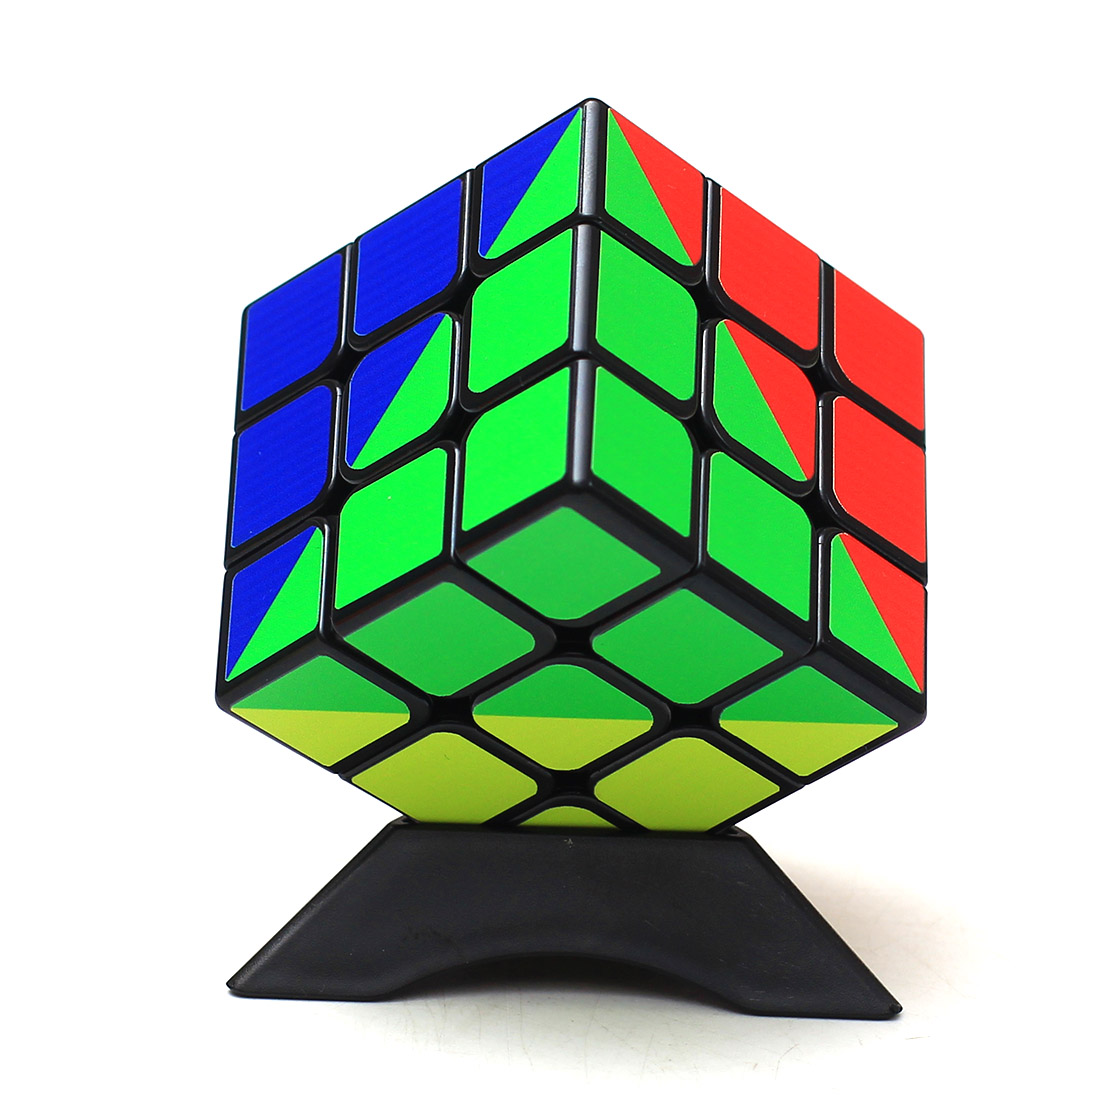 Z-cube Rainbow Type 3x3x3 Magic Cube Puzzle Cube Intelligent Gift Toys For Kids - Black цена